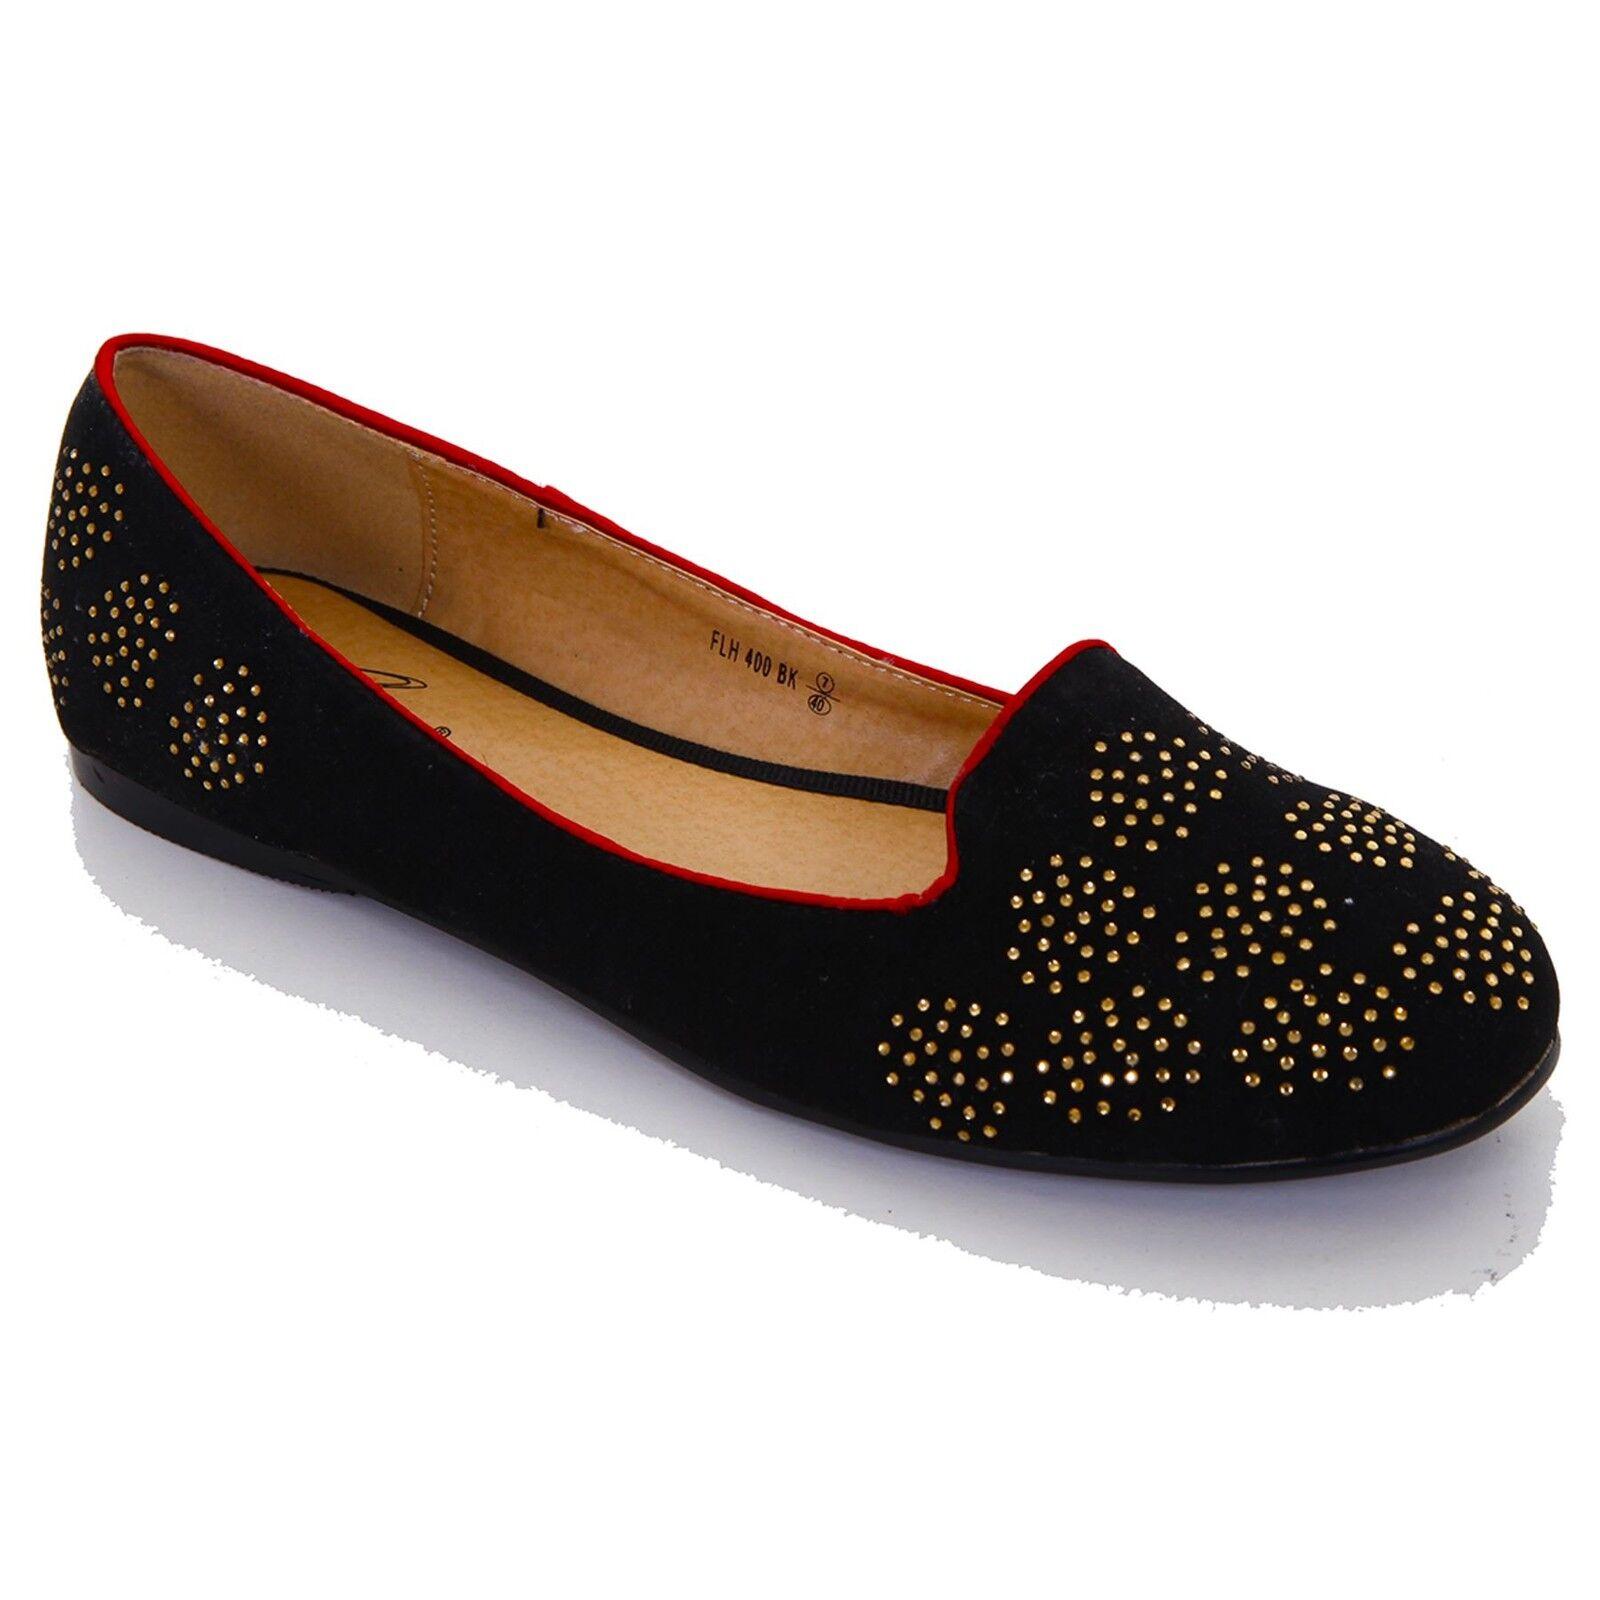 Ladies Flat Gold Diamante Heart Elegant Red Trim Smart Women's Loafer Shoes